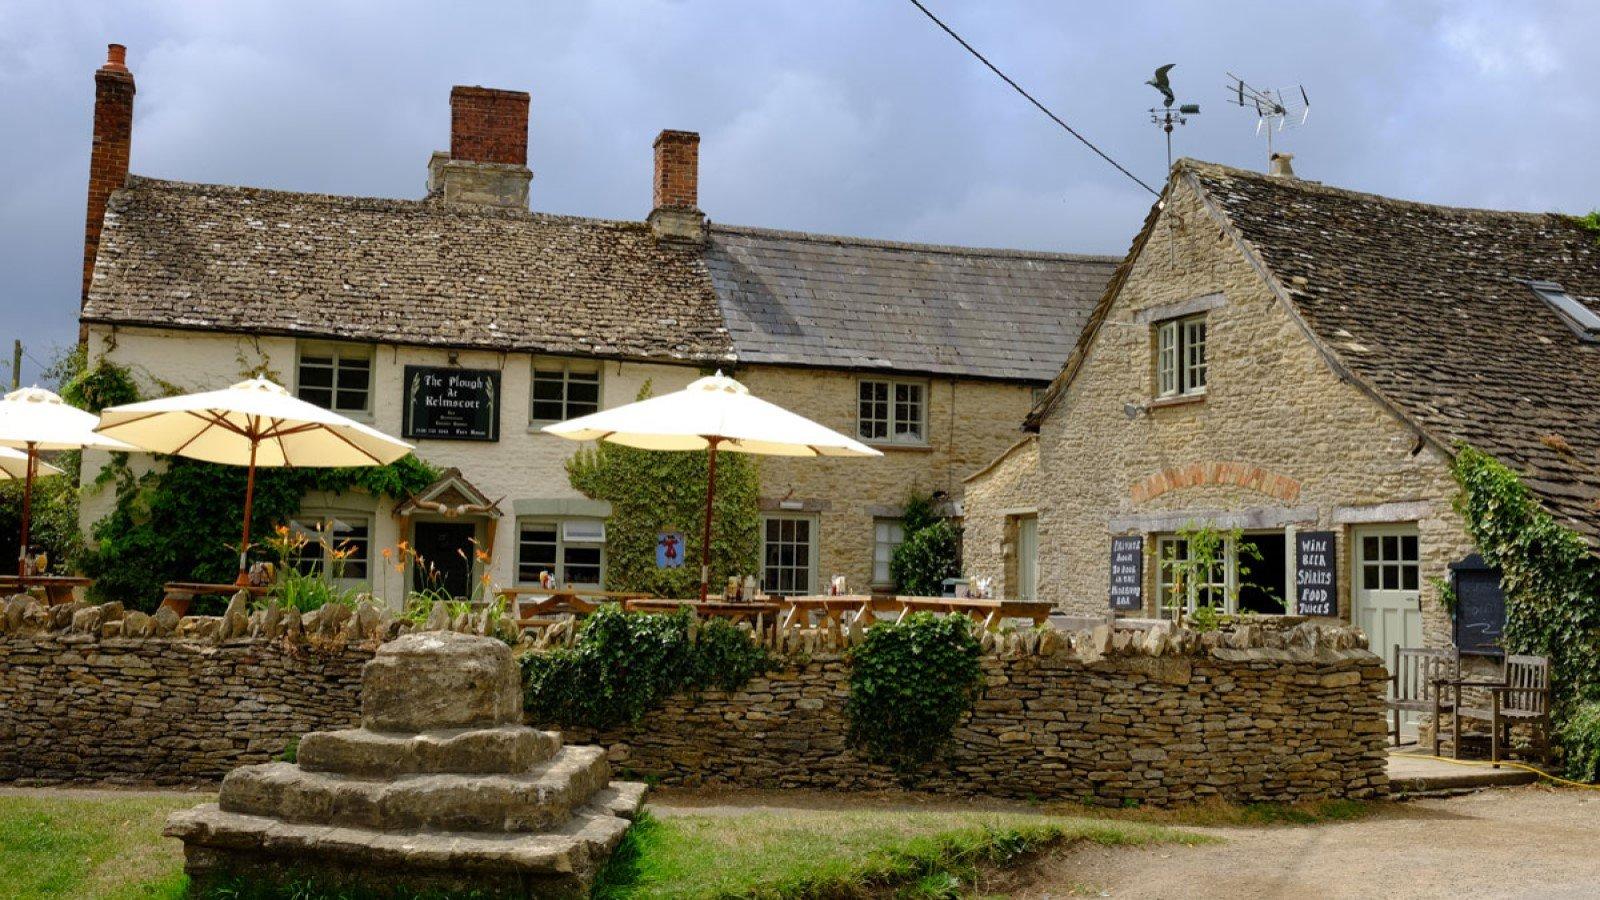 The Plough Kelmscott, Oxfordshire Pub Inn Exterior